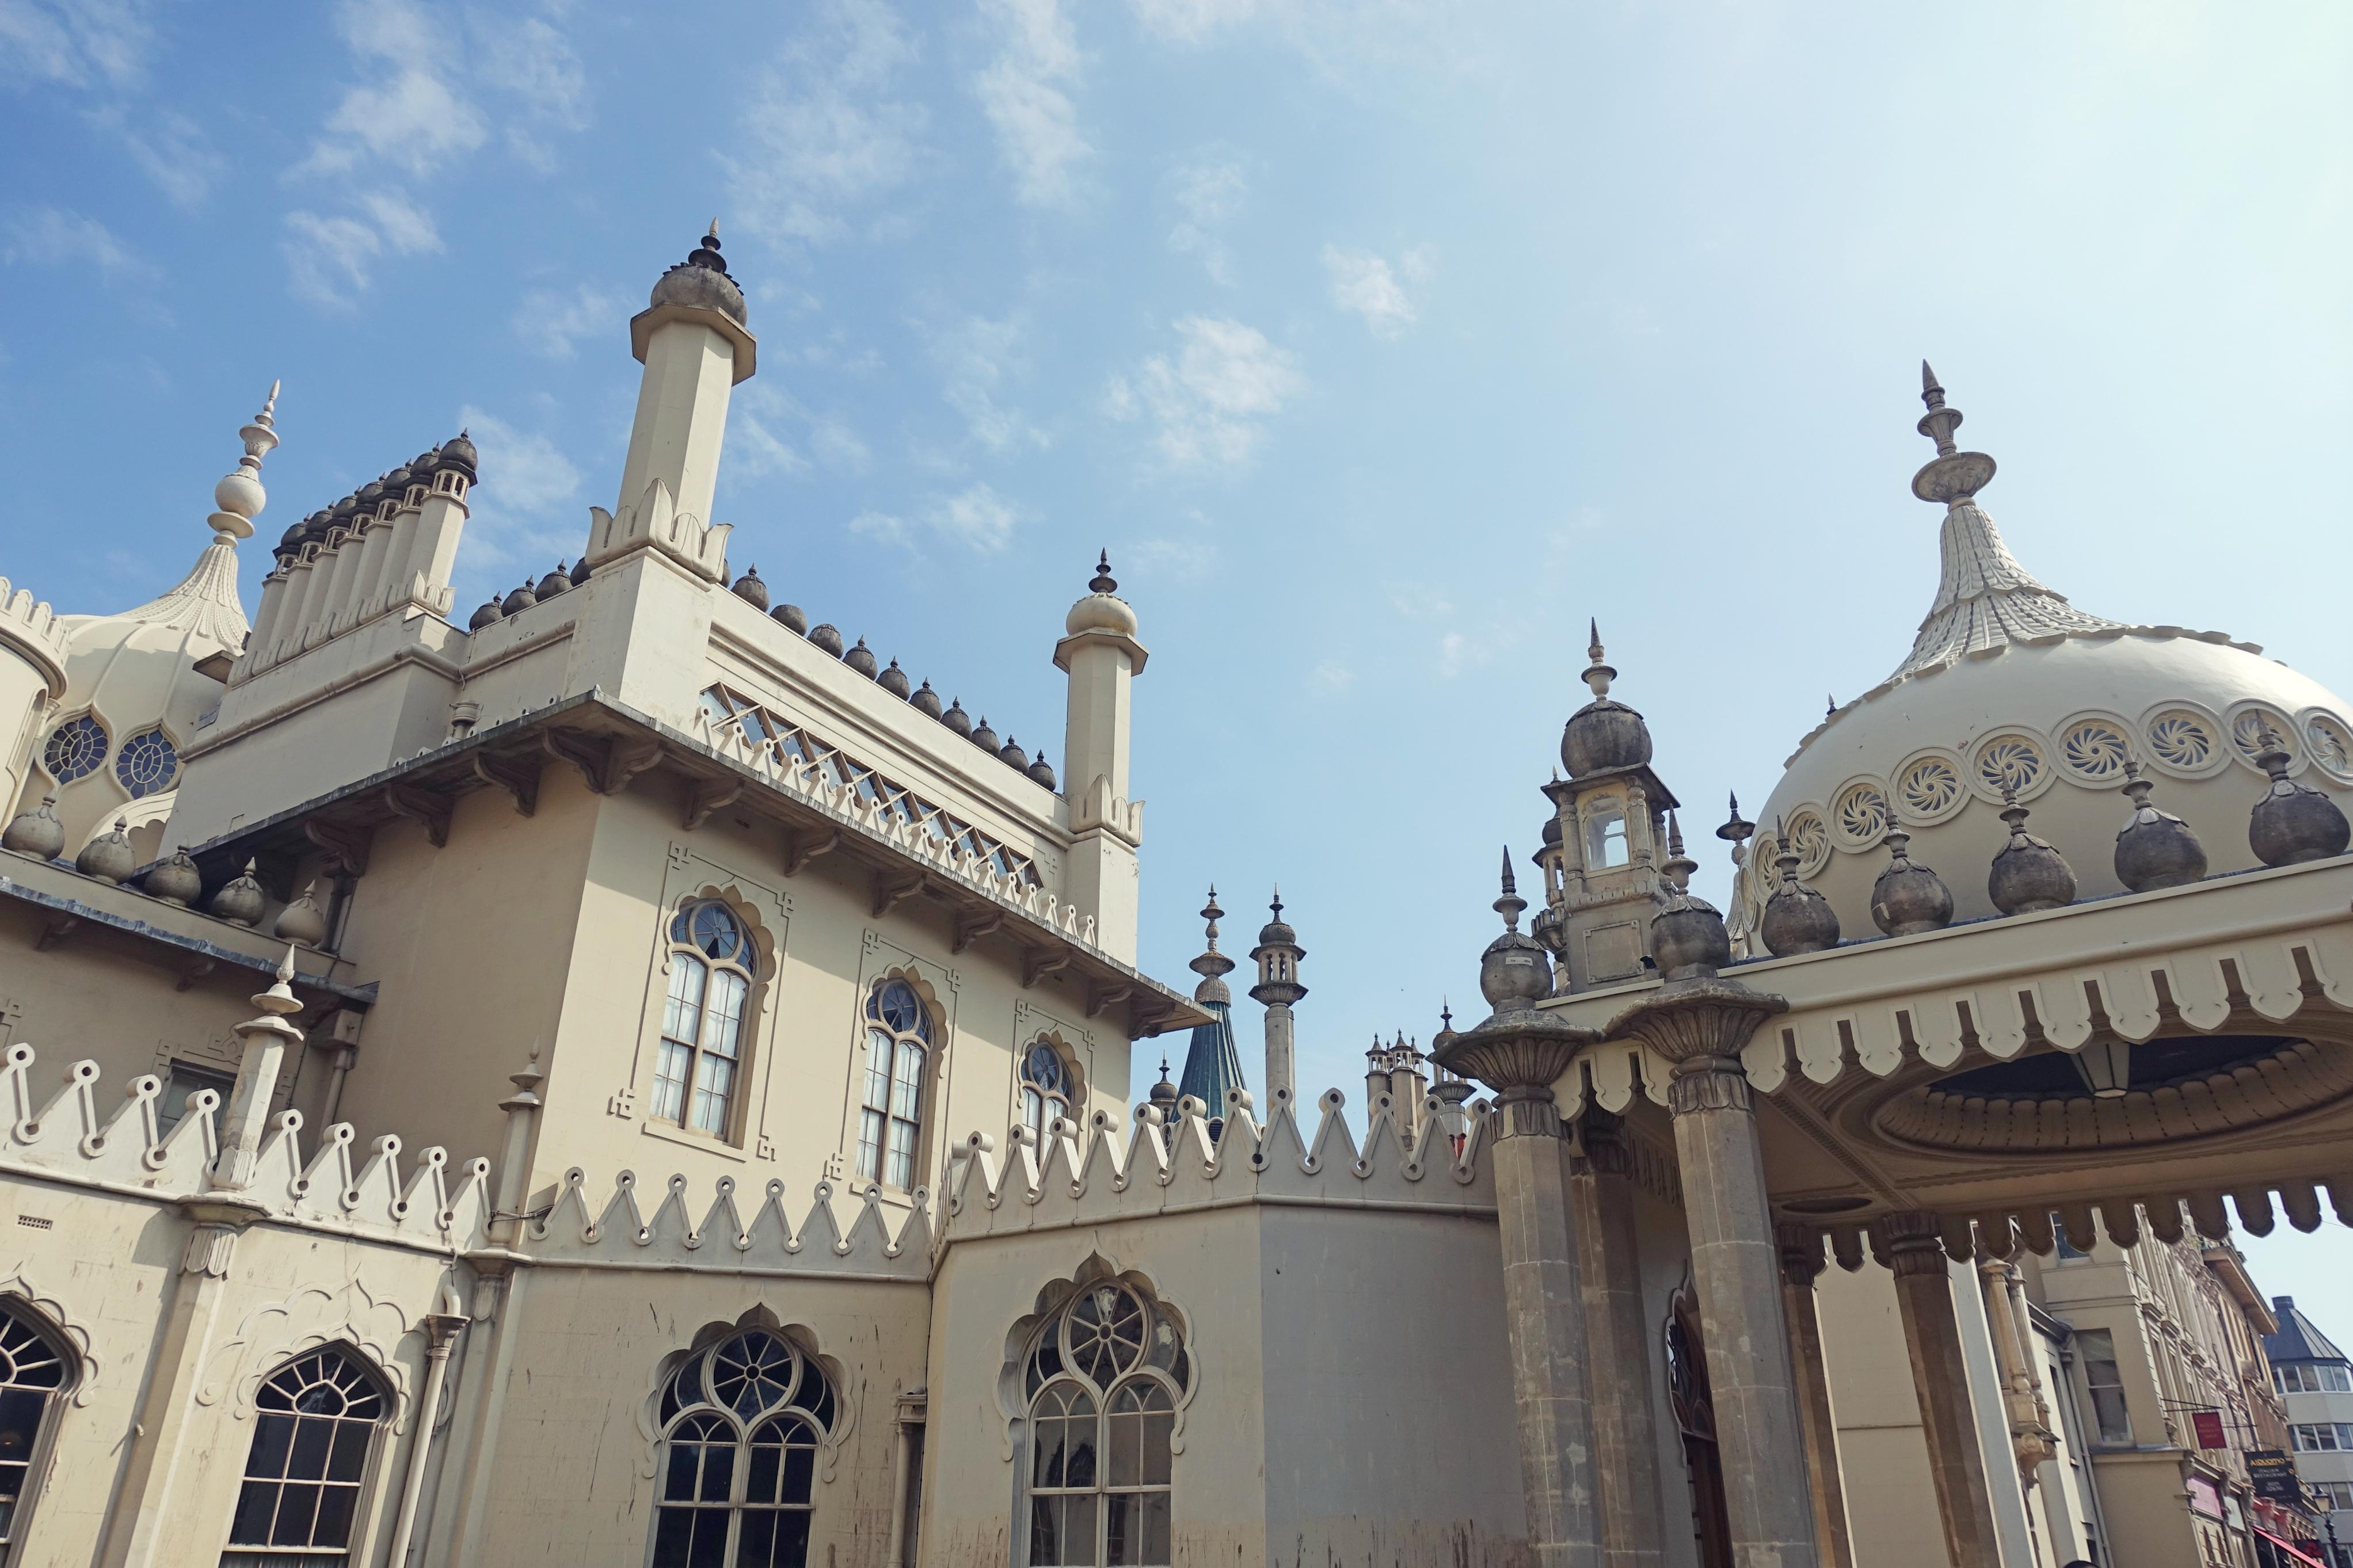 Royal-Pavilion-Brighton-blog-de-viajes-ChicAdicta-fashionista-influencer-Chic-adicta-PiensaenChic-Piensa-en-Chic